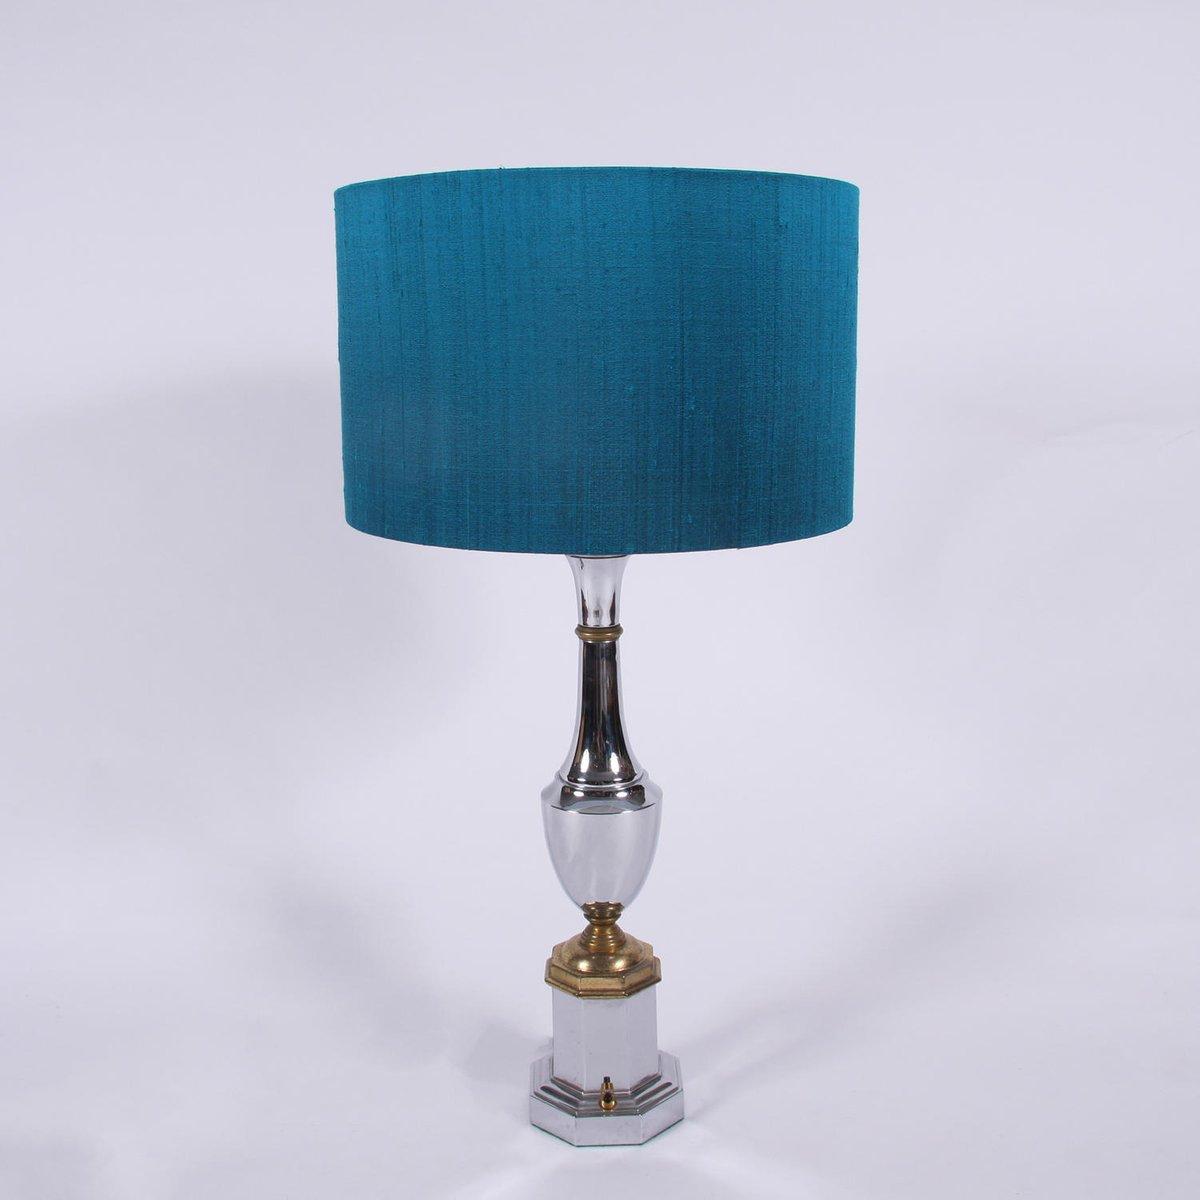 Mid-Century Tischlampen aus Chrom, 2er Set